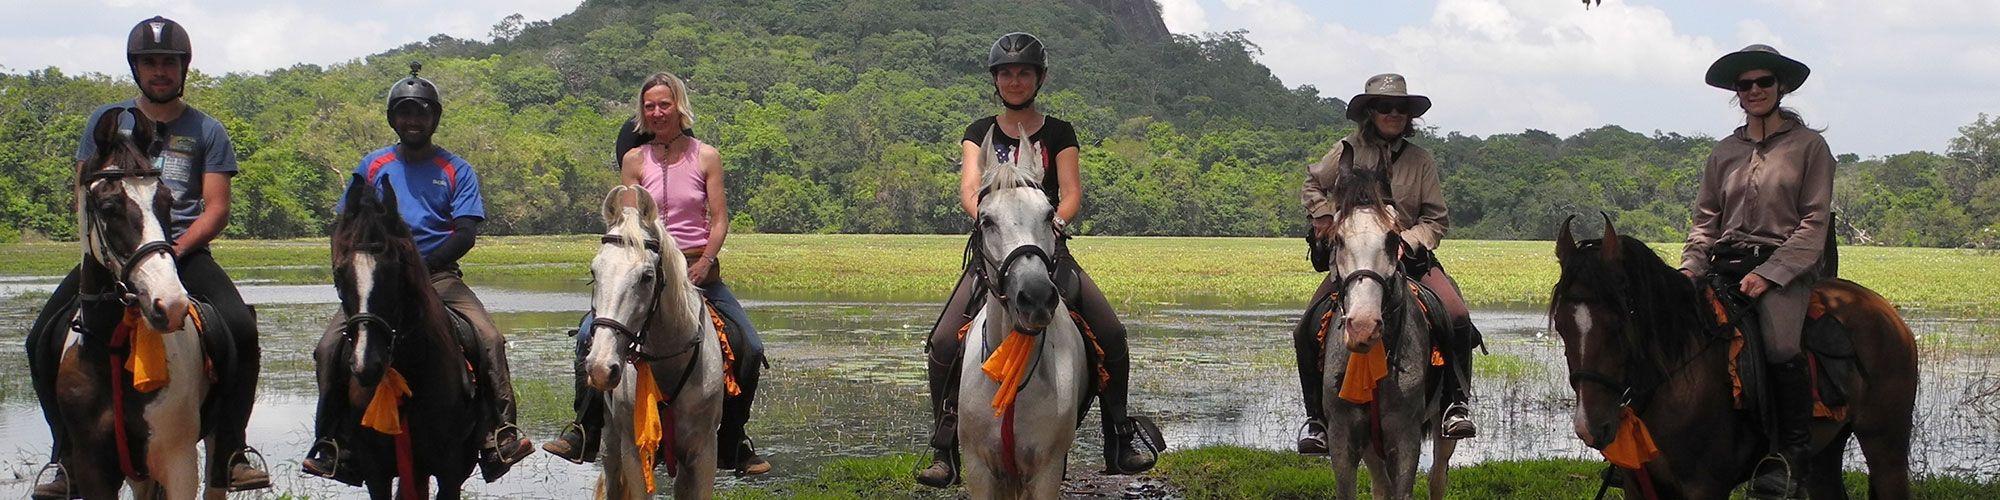 Cavaliers, chevaux, Sigiriya, Sri Lanka